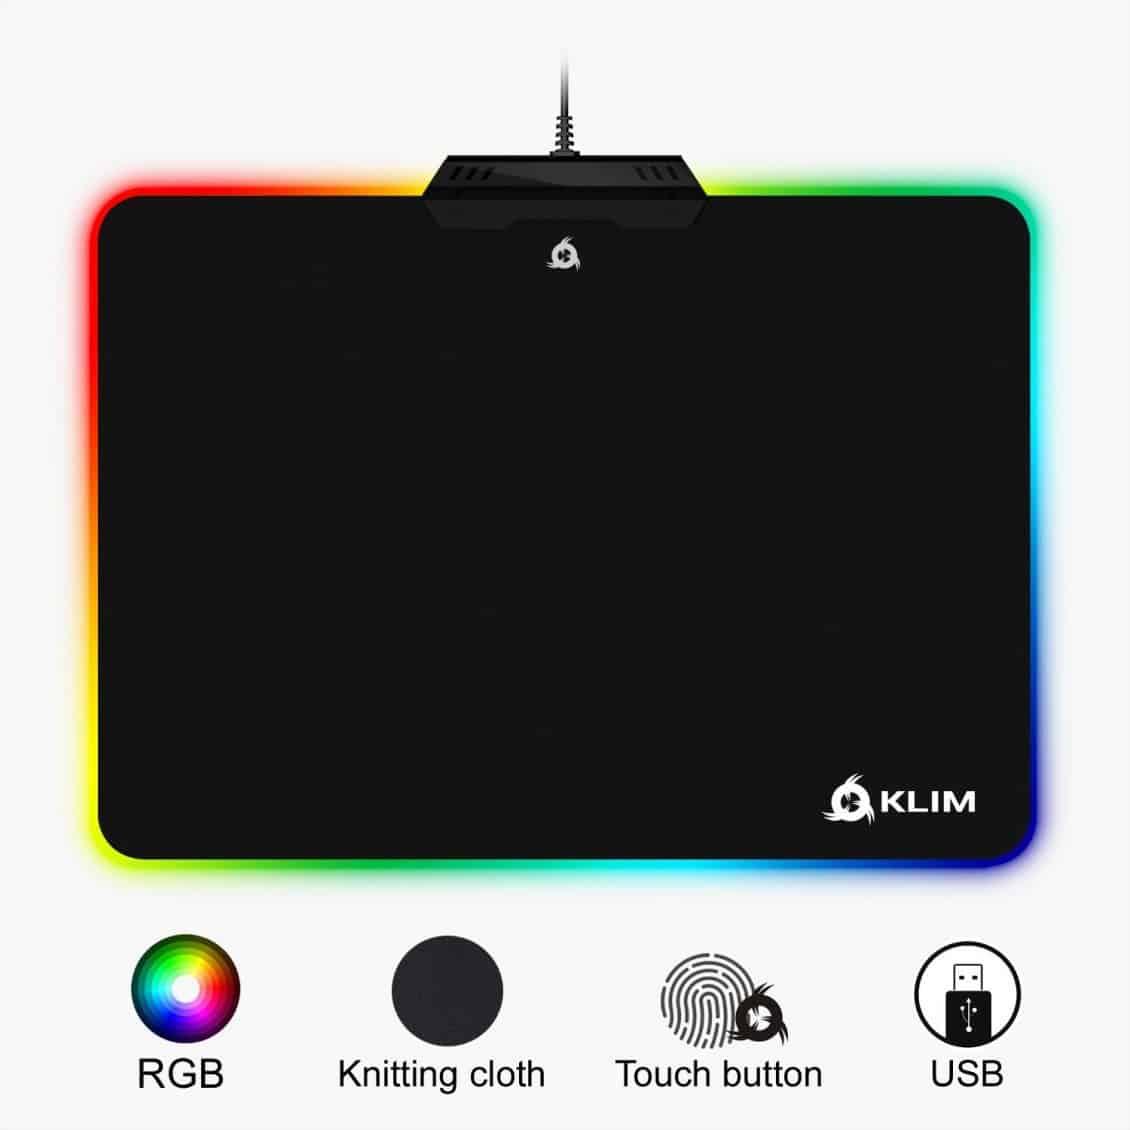 Recensione Klim RGB Mousepad Chroma - 71RGTNP83nL. SL1500